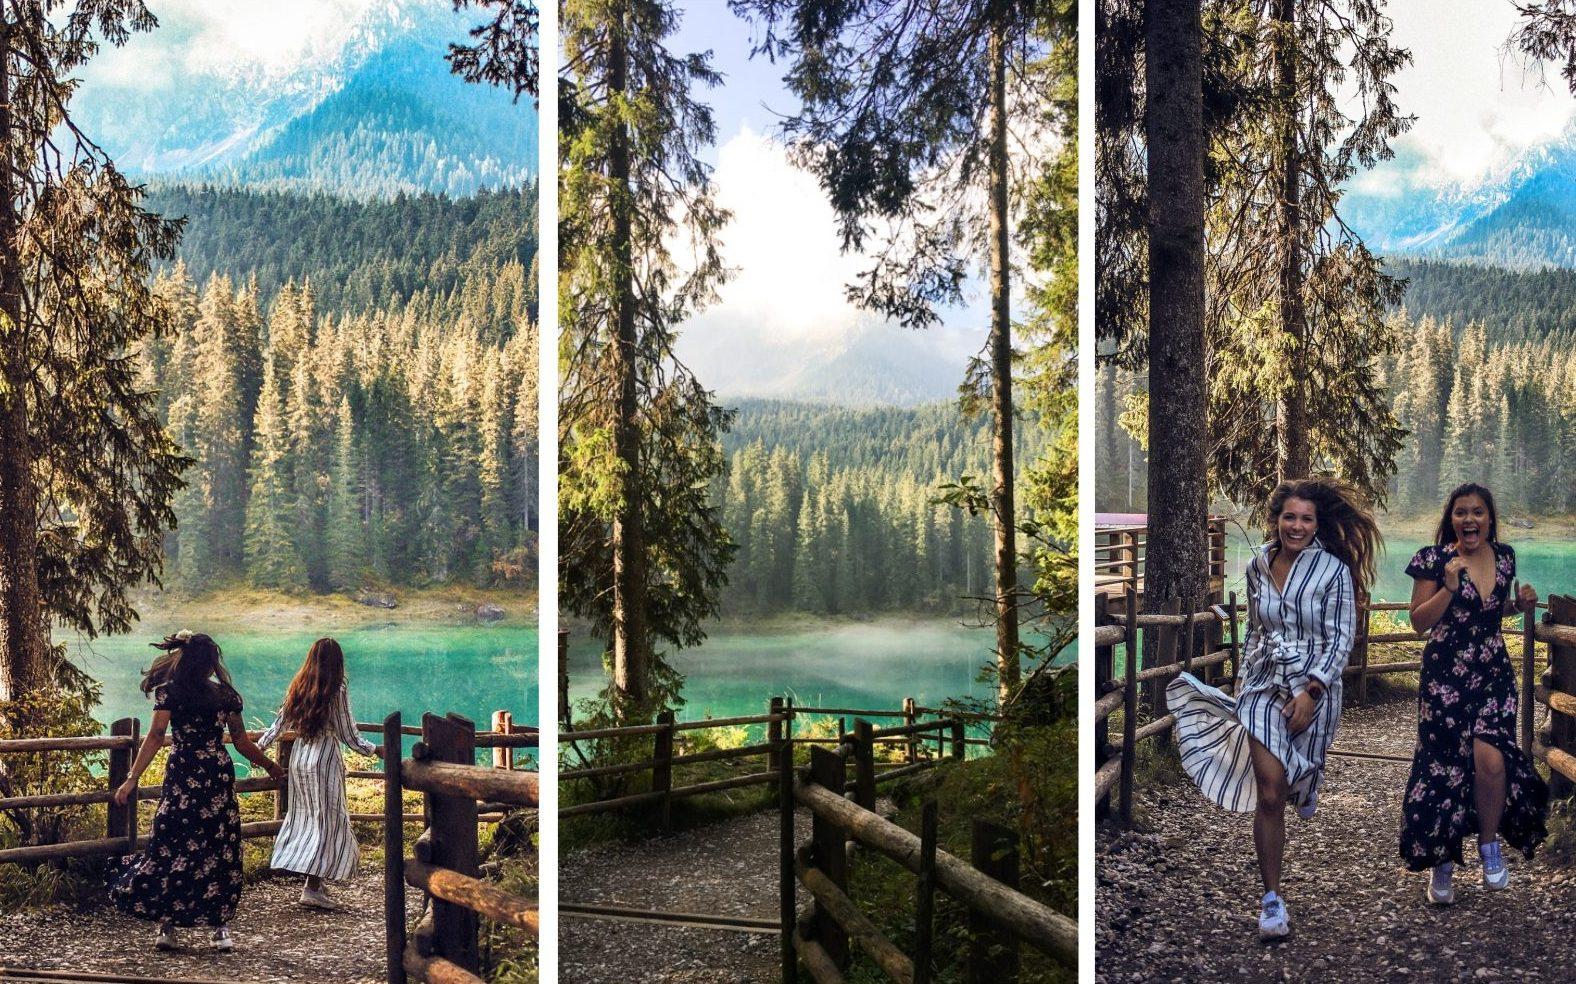 Karrersee Zuid-Tirol